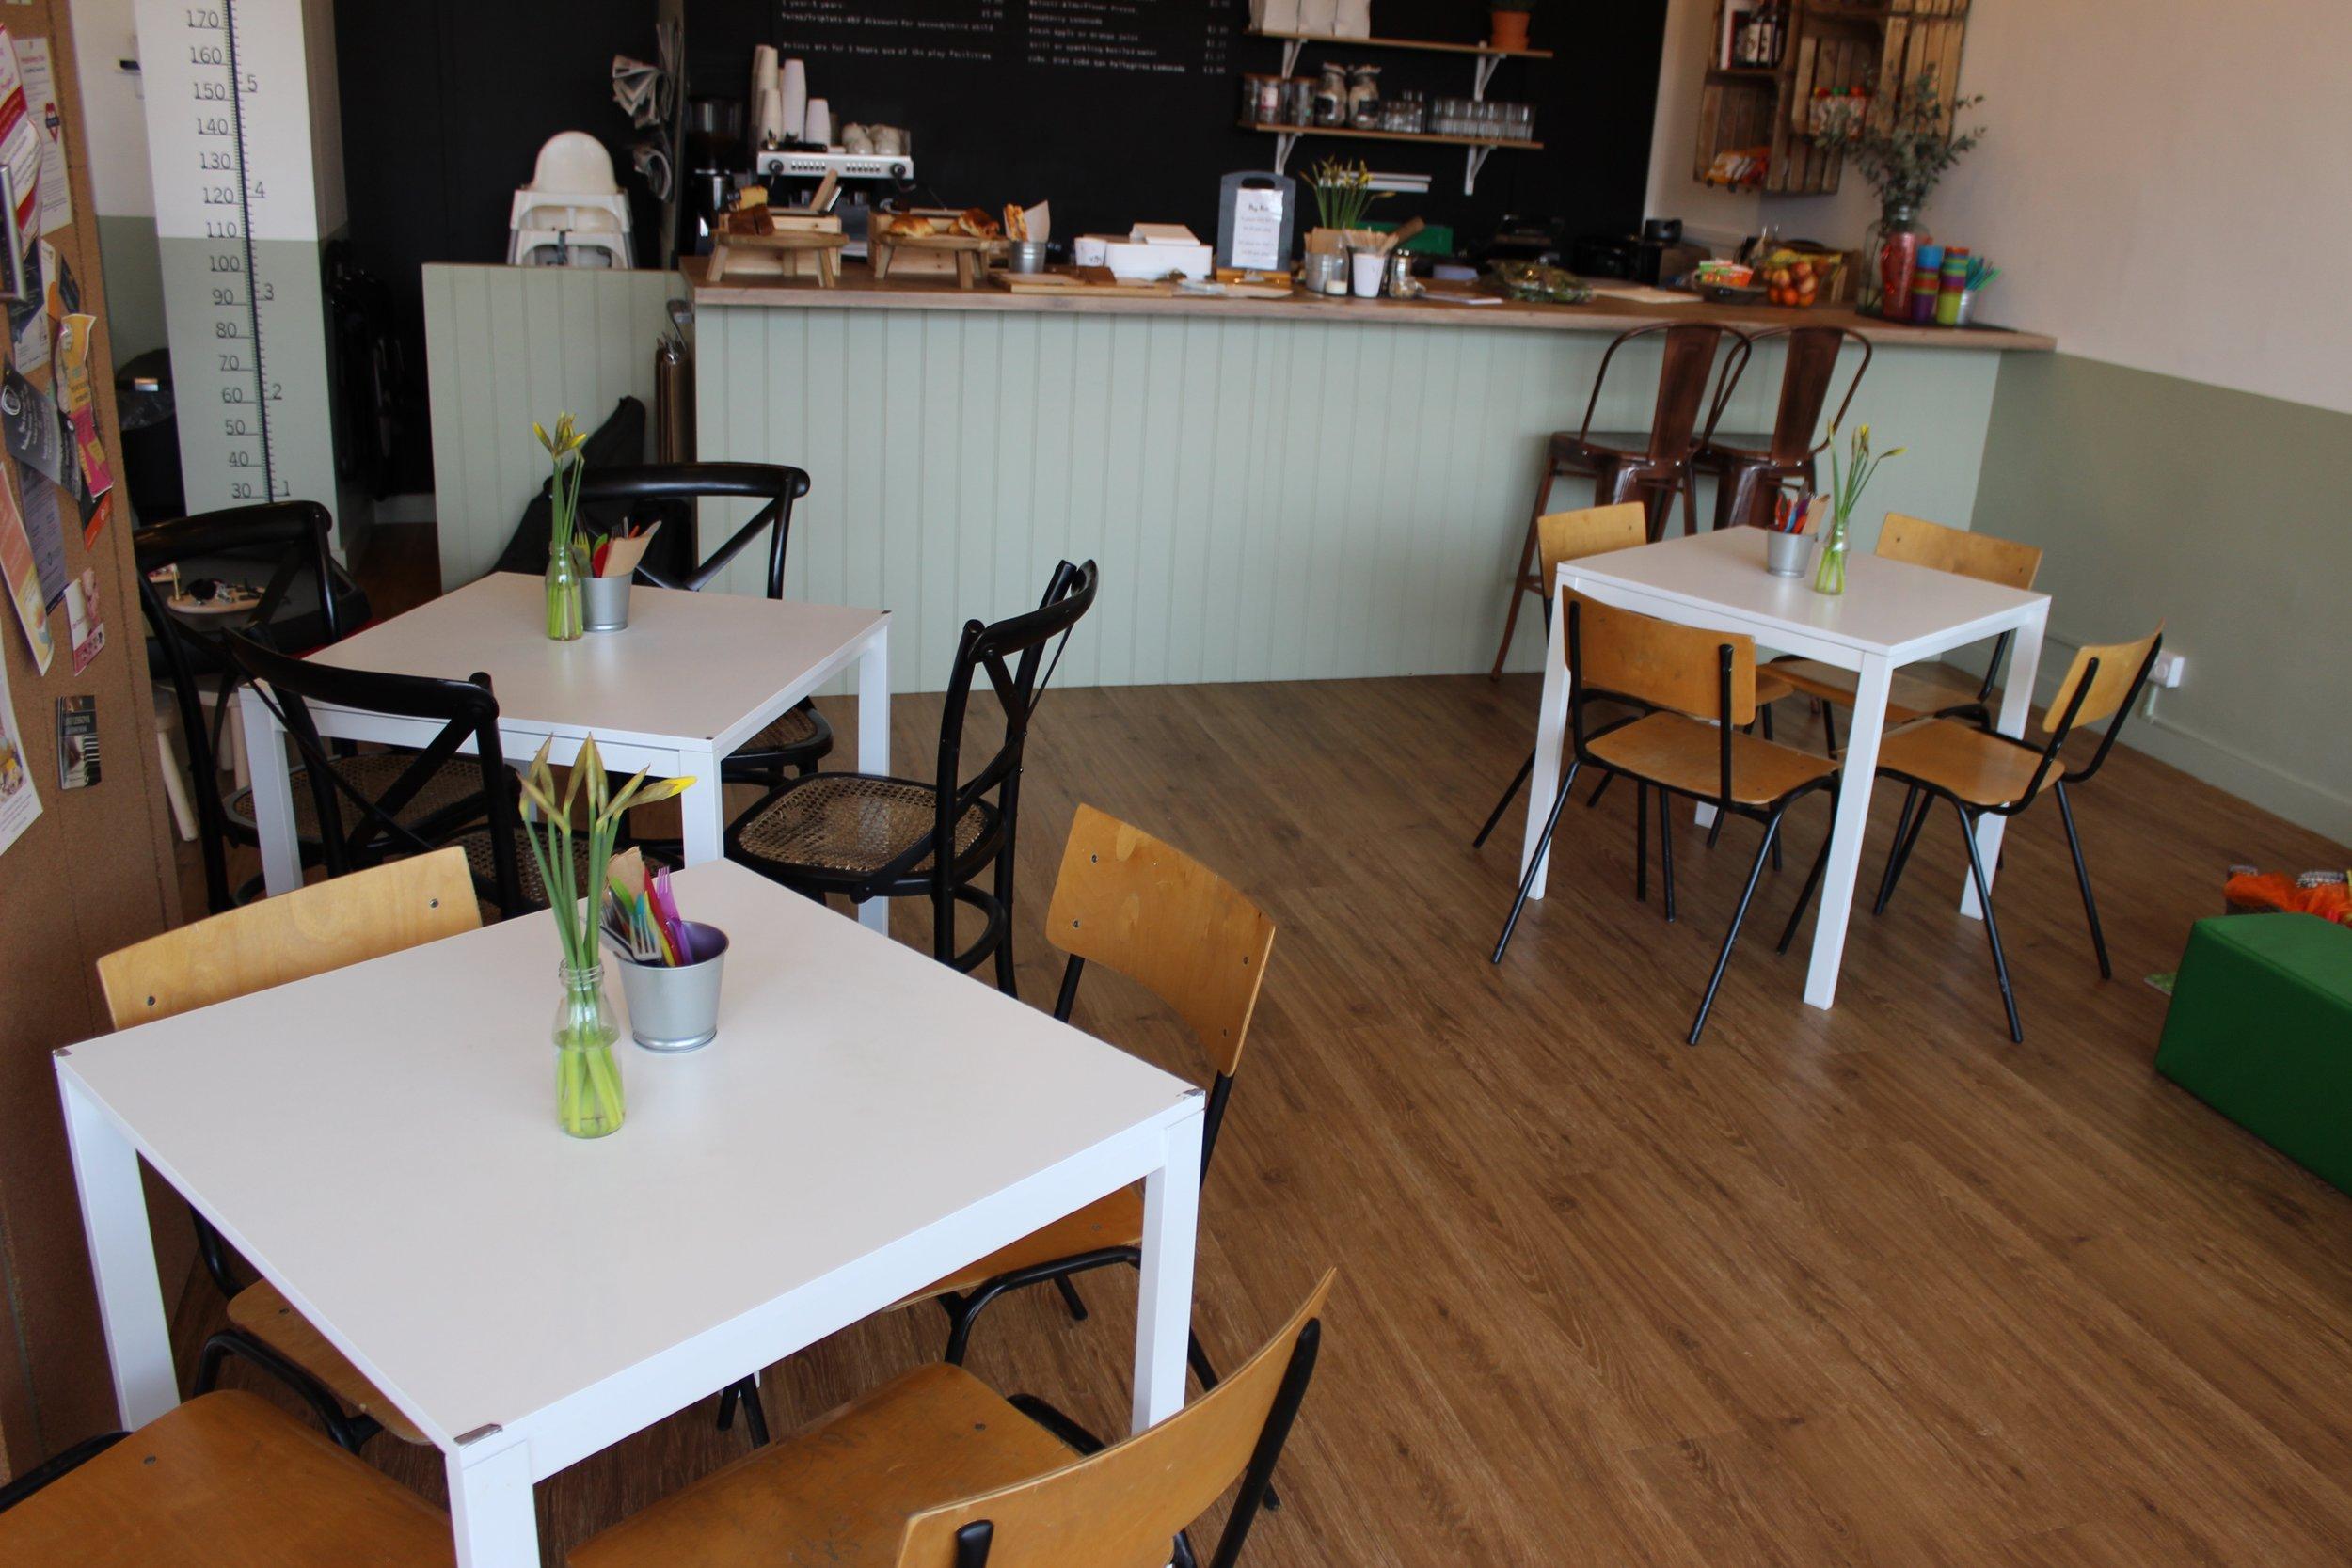 Apple Tree Children's Cafe in Herne Hill South London 5.jpg